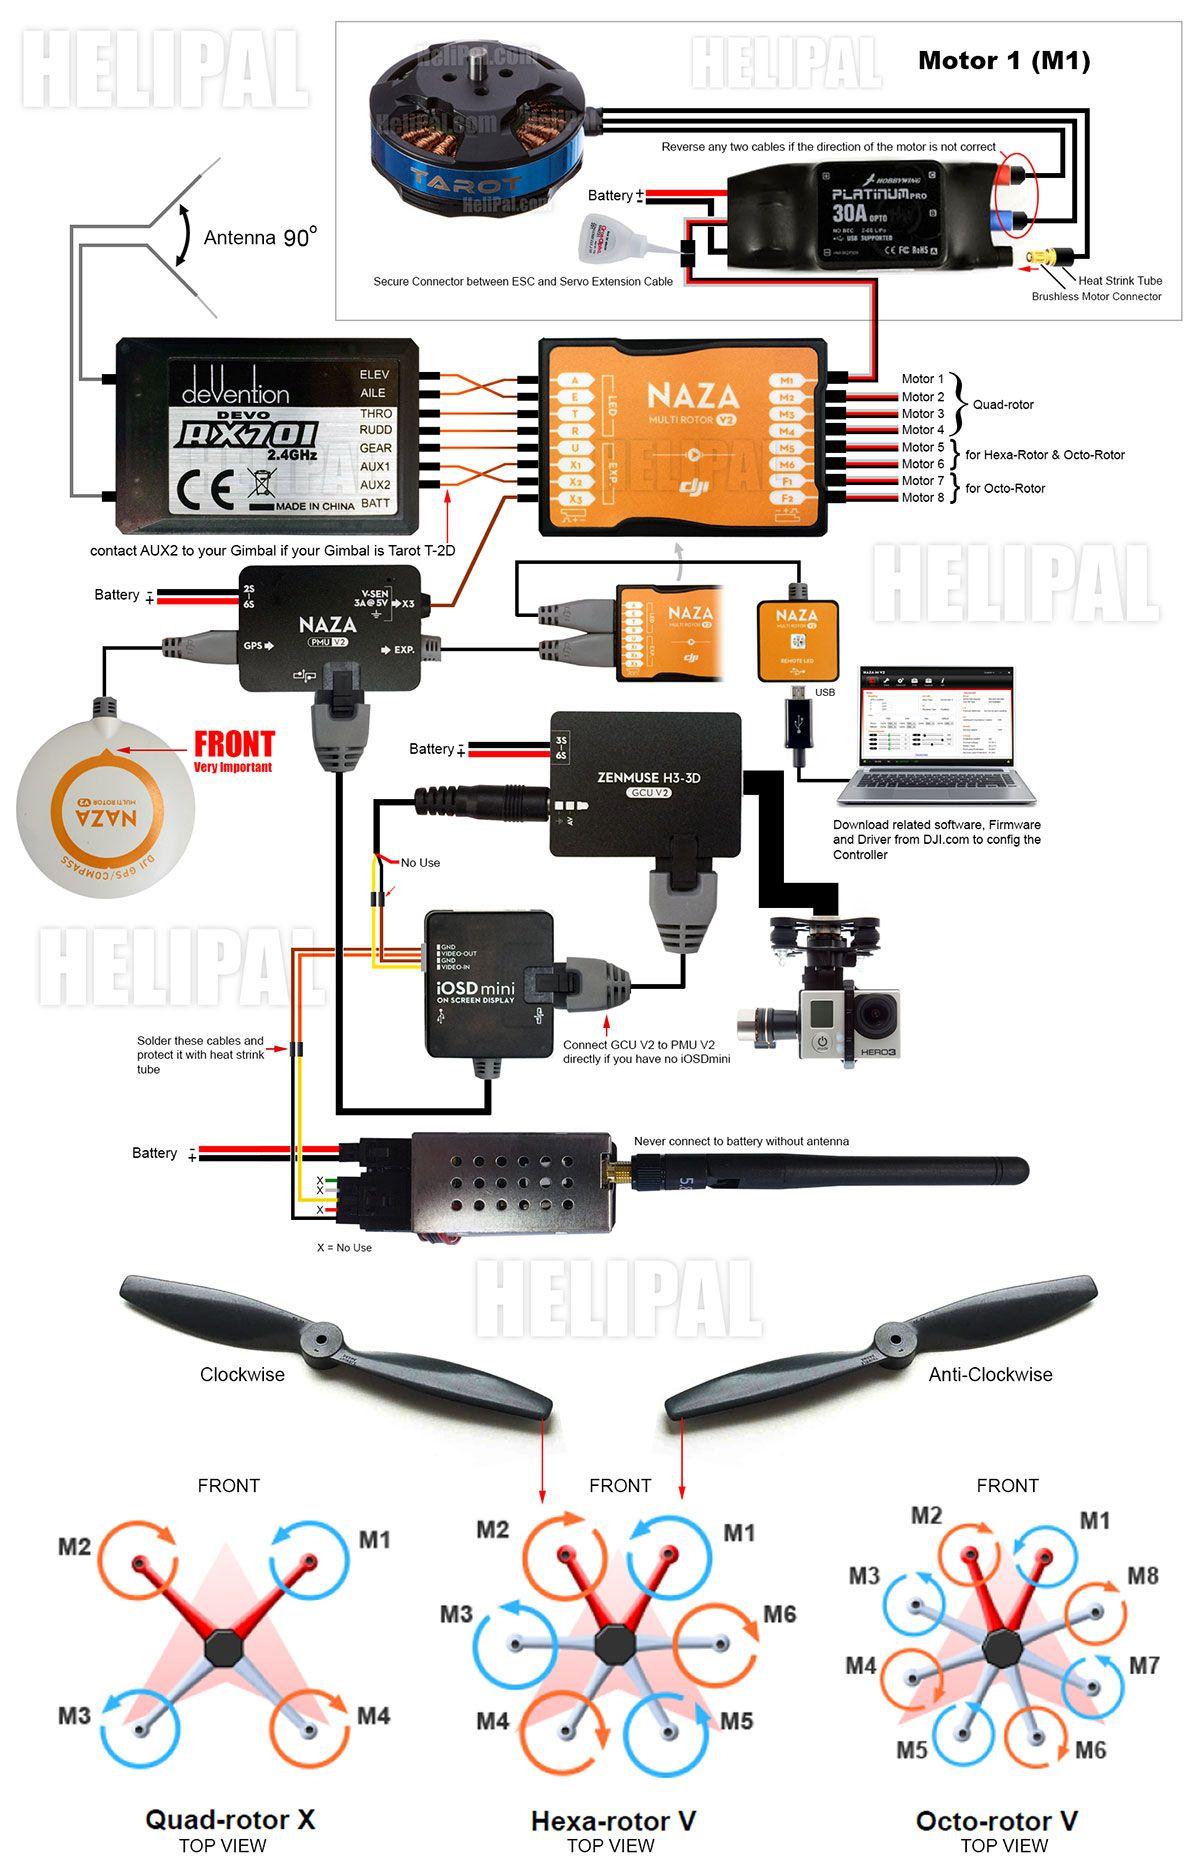 fpv quadcopter wiring diagram honda crv kingtoys mini drone rc with cameras wifi